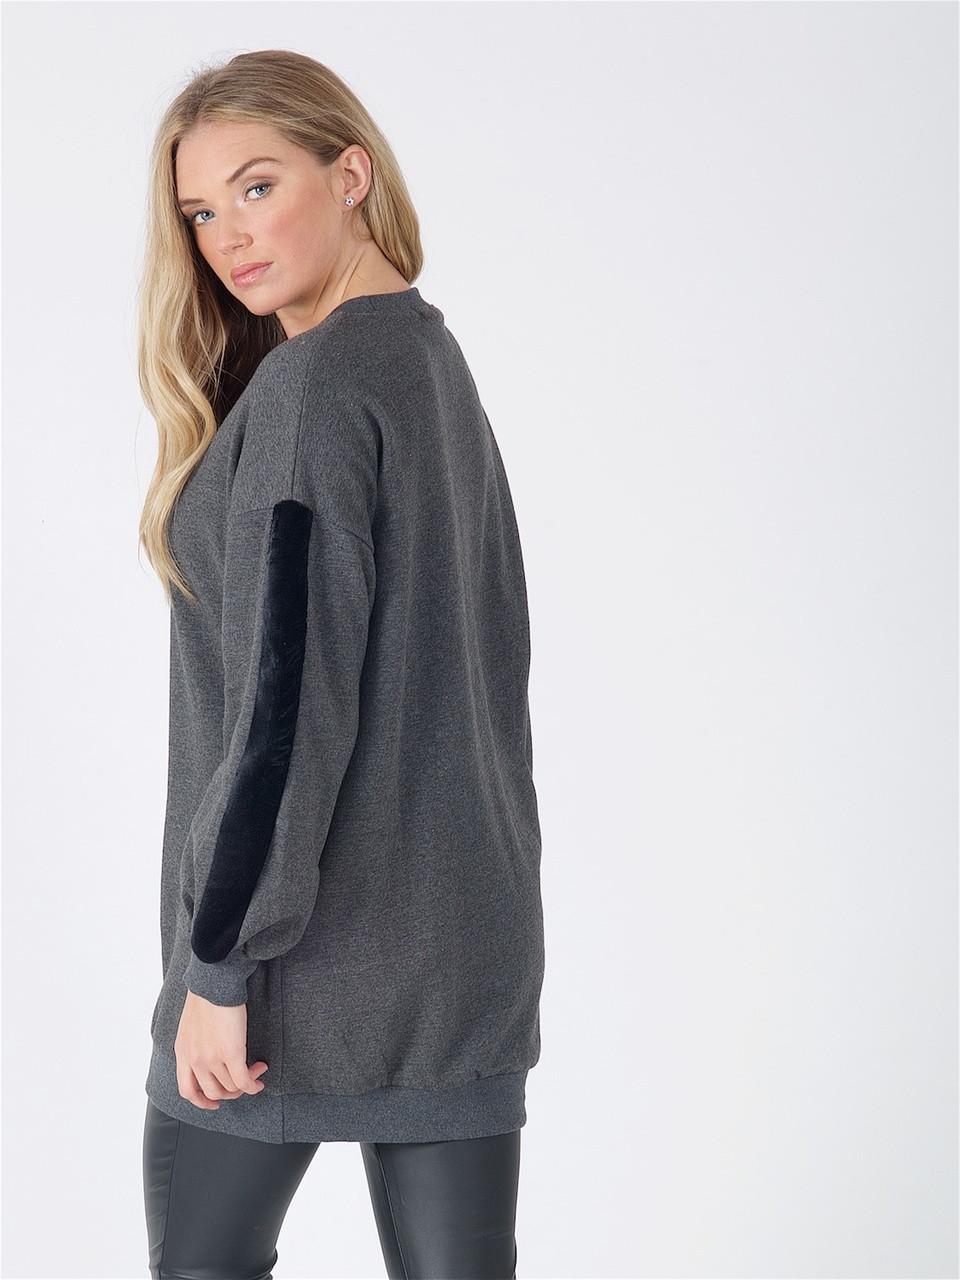 Charcoal Oversized Fur Stripe Sleeve Jumper